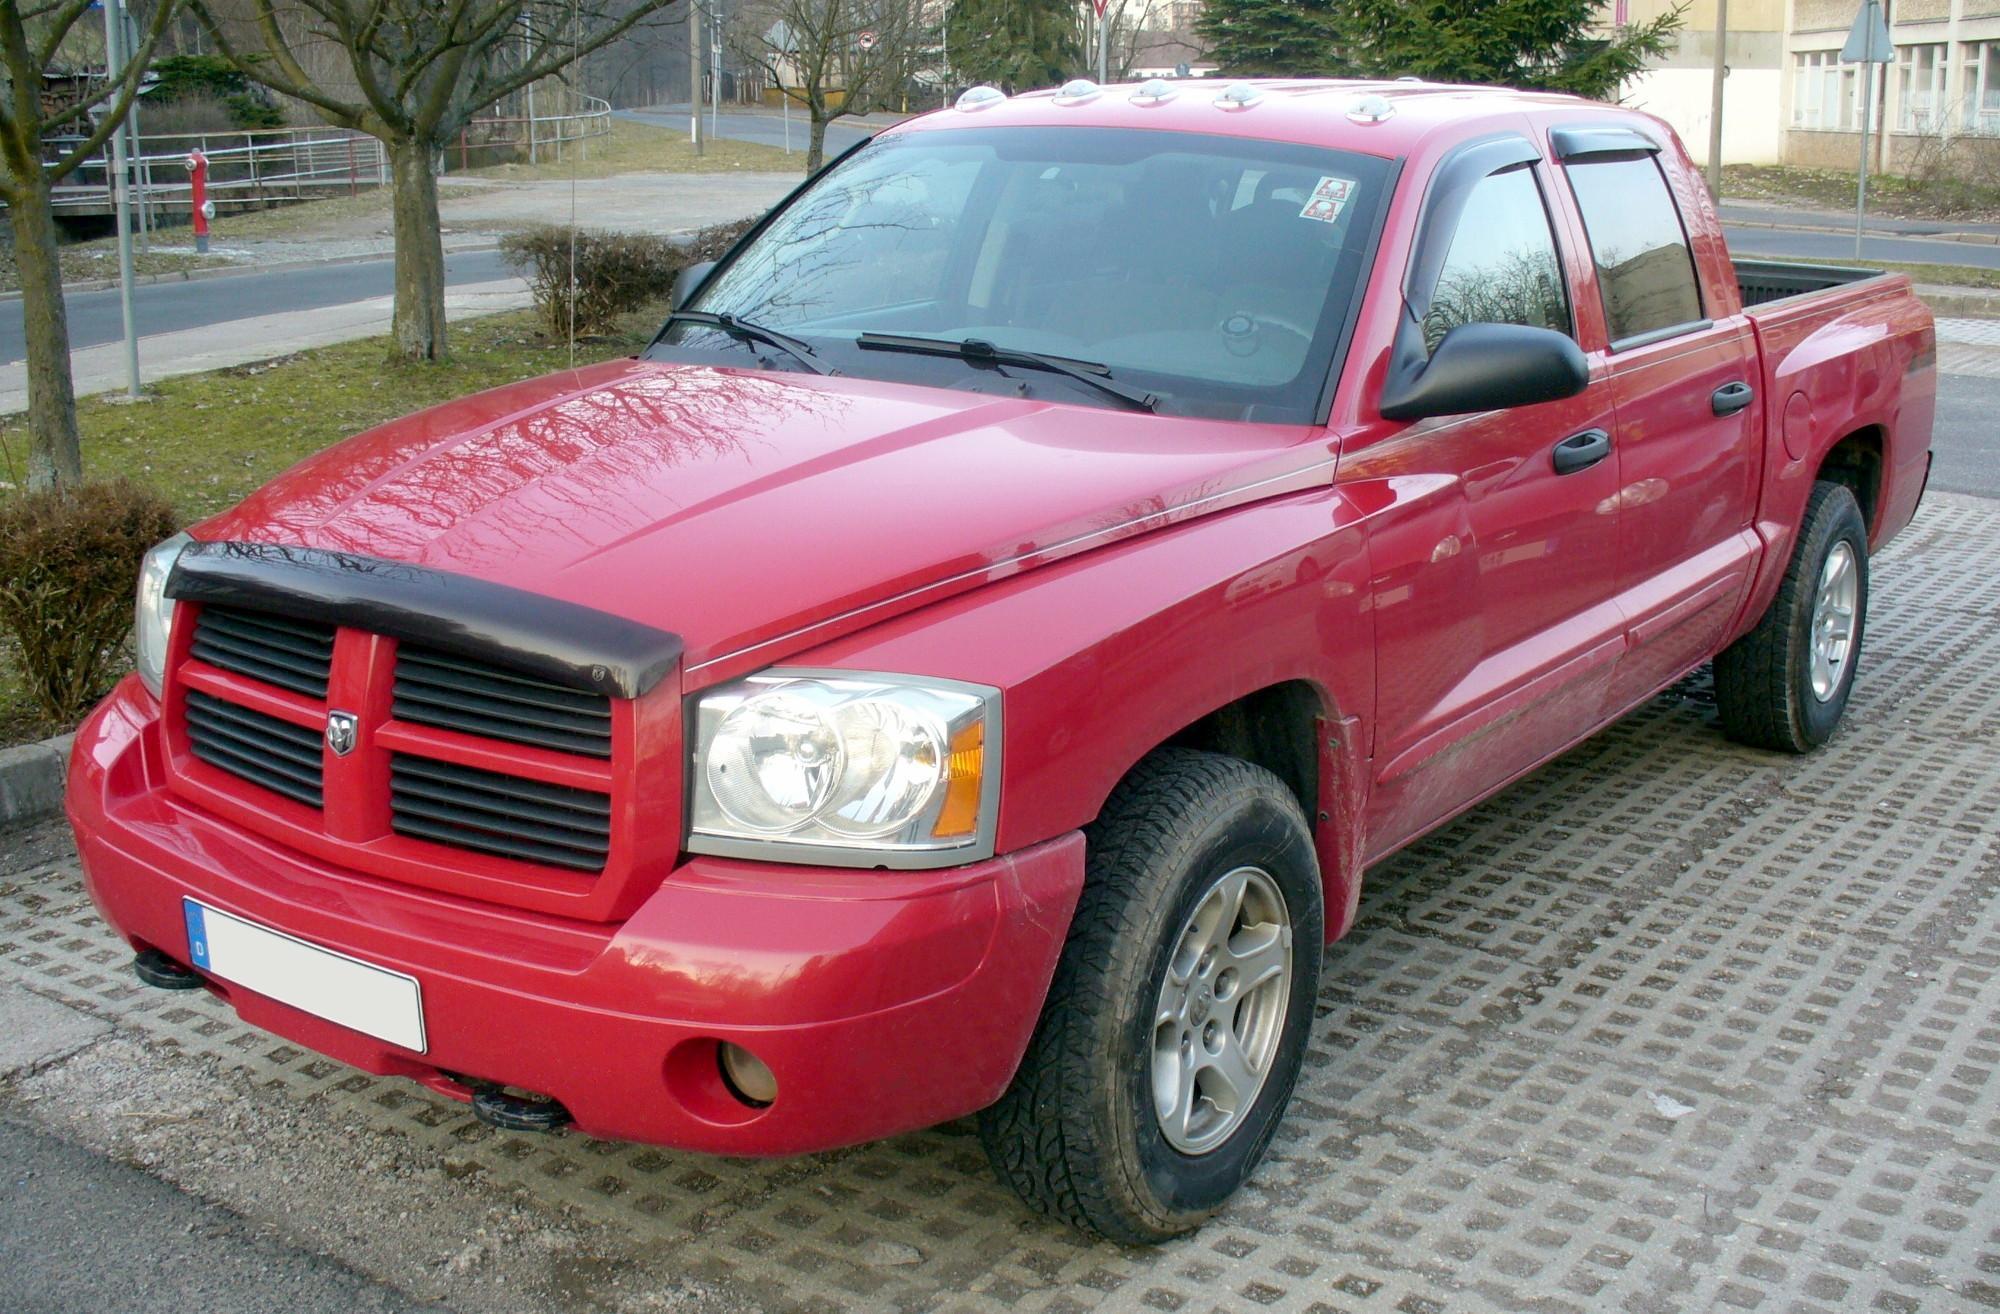 File:Dodge Dakota SLS 4x4 Magnum-V8.JPG - Wikimedia Commons